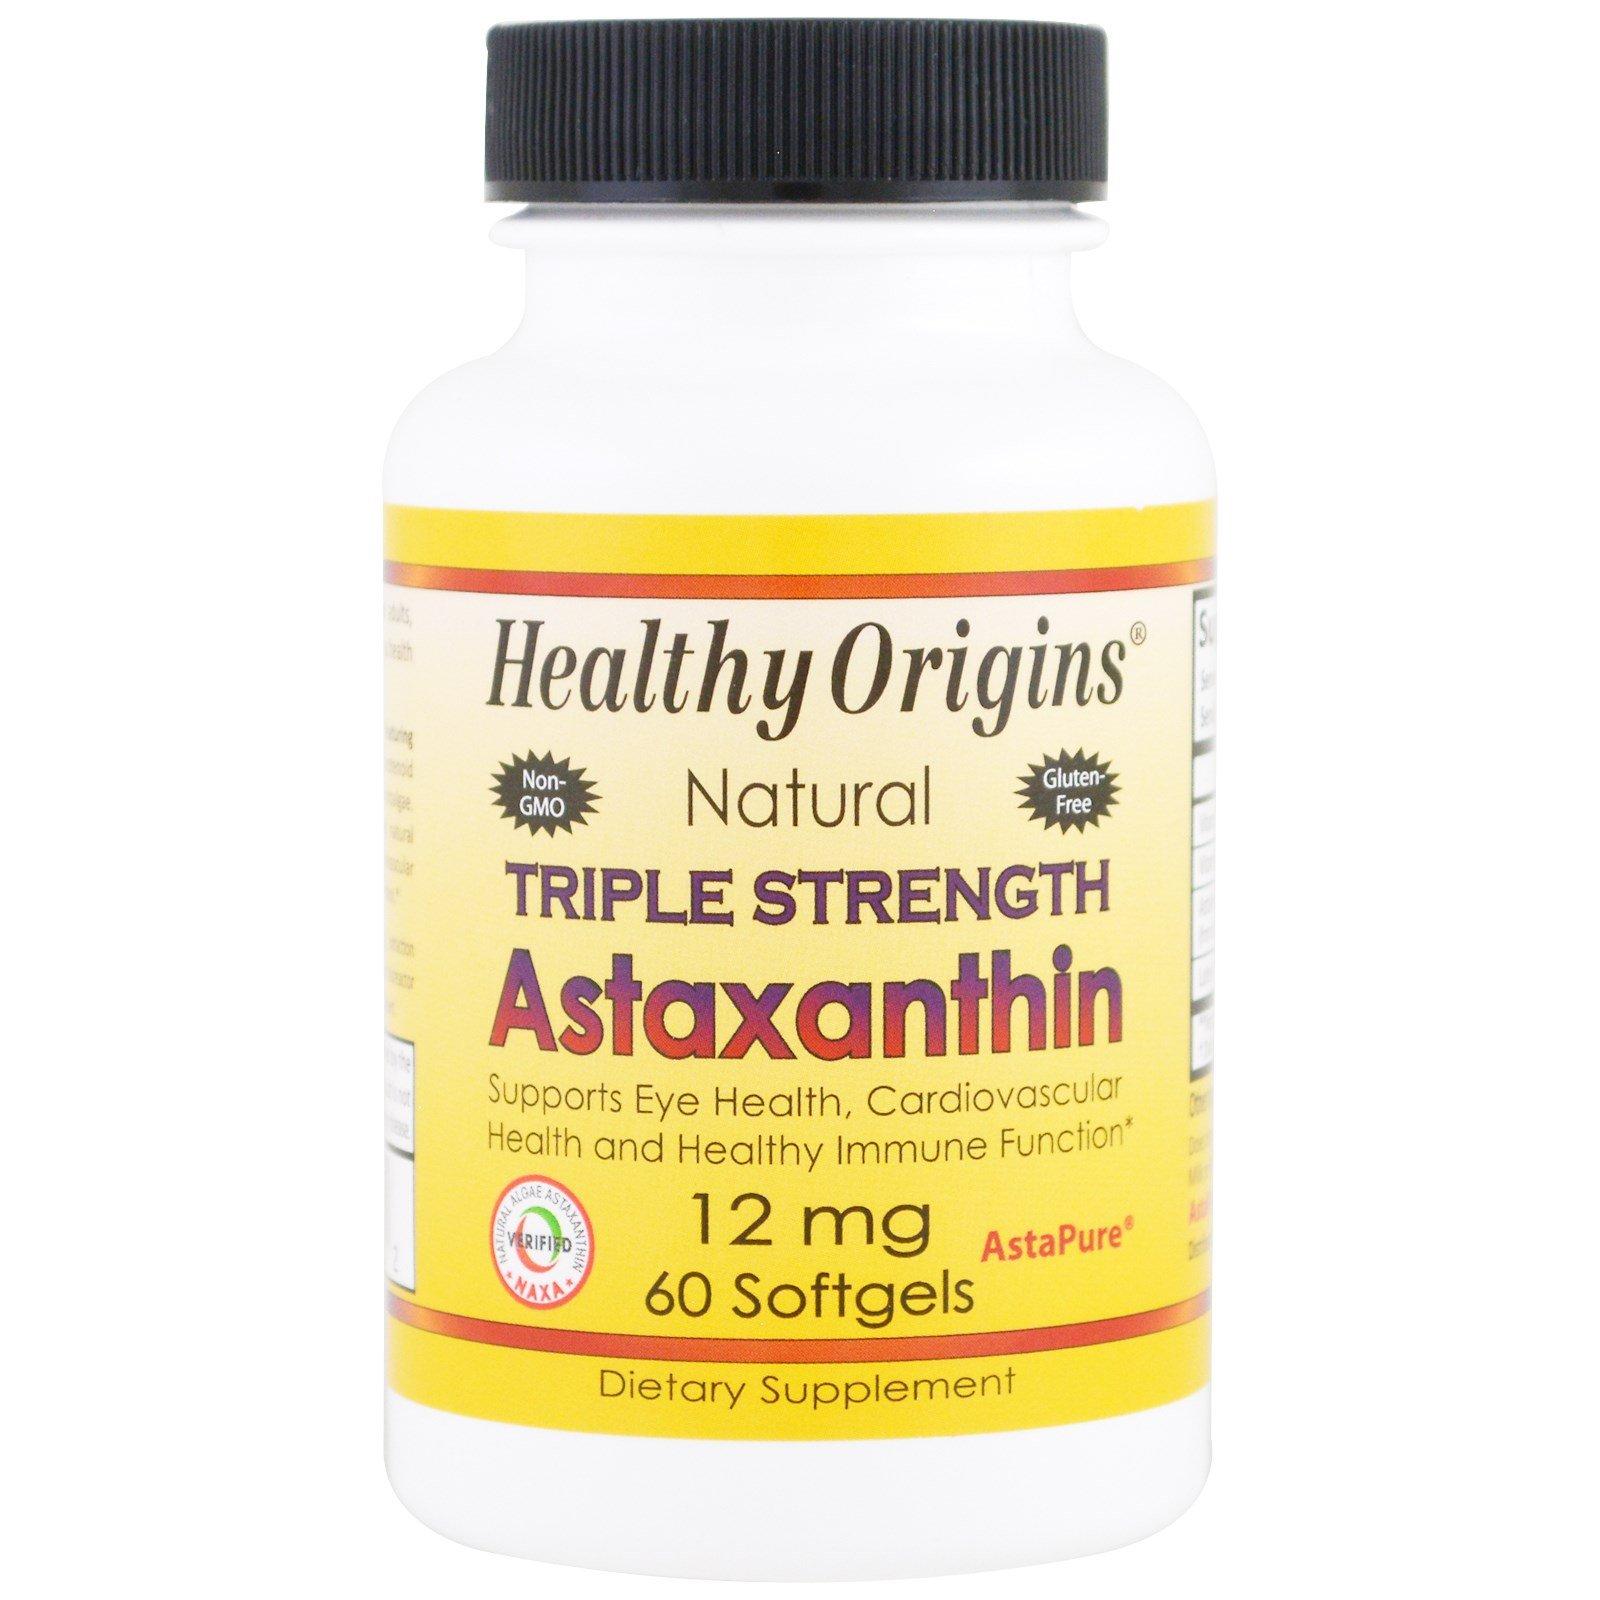 Healthy Origins, Natural Triple Strength Astaxanthin, 12 mg, 60 Softgels - 3PC